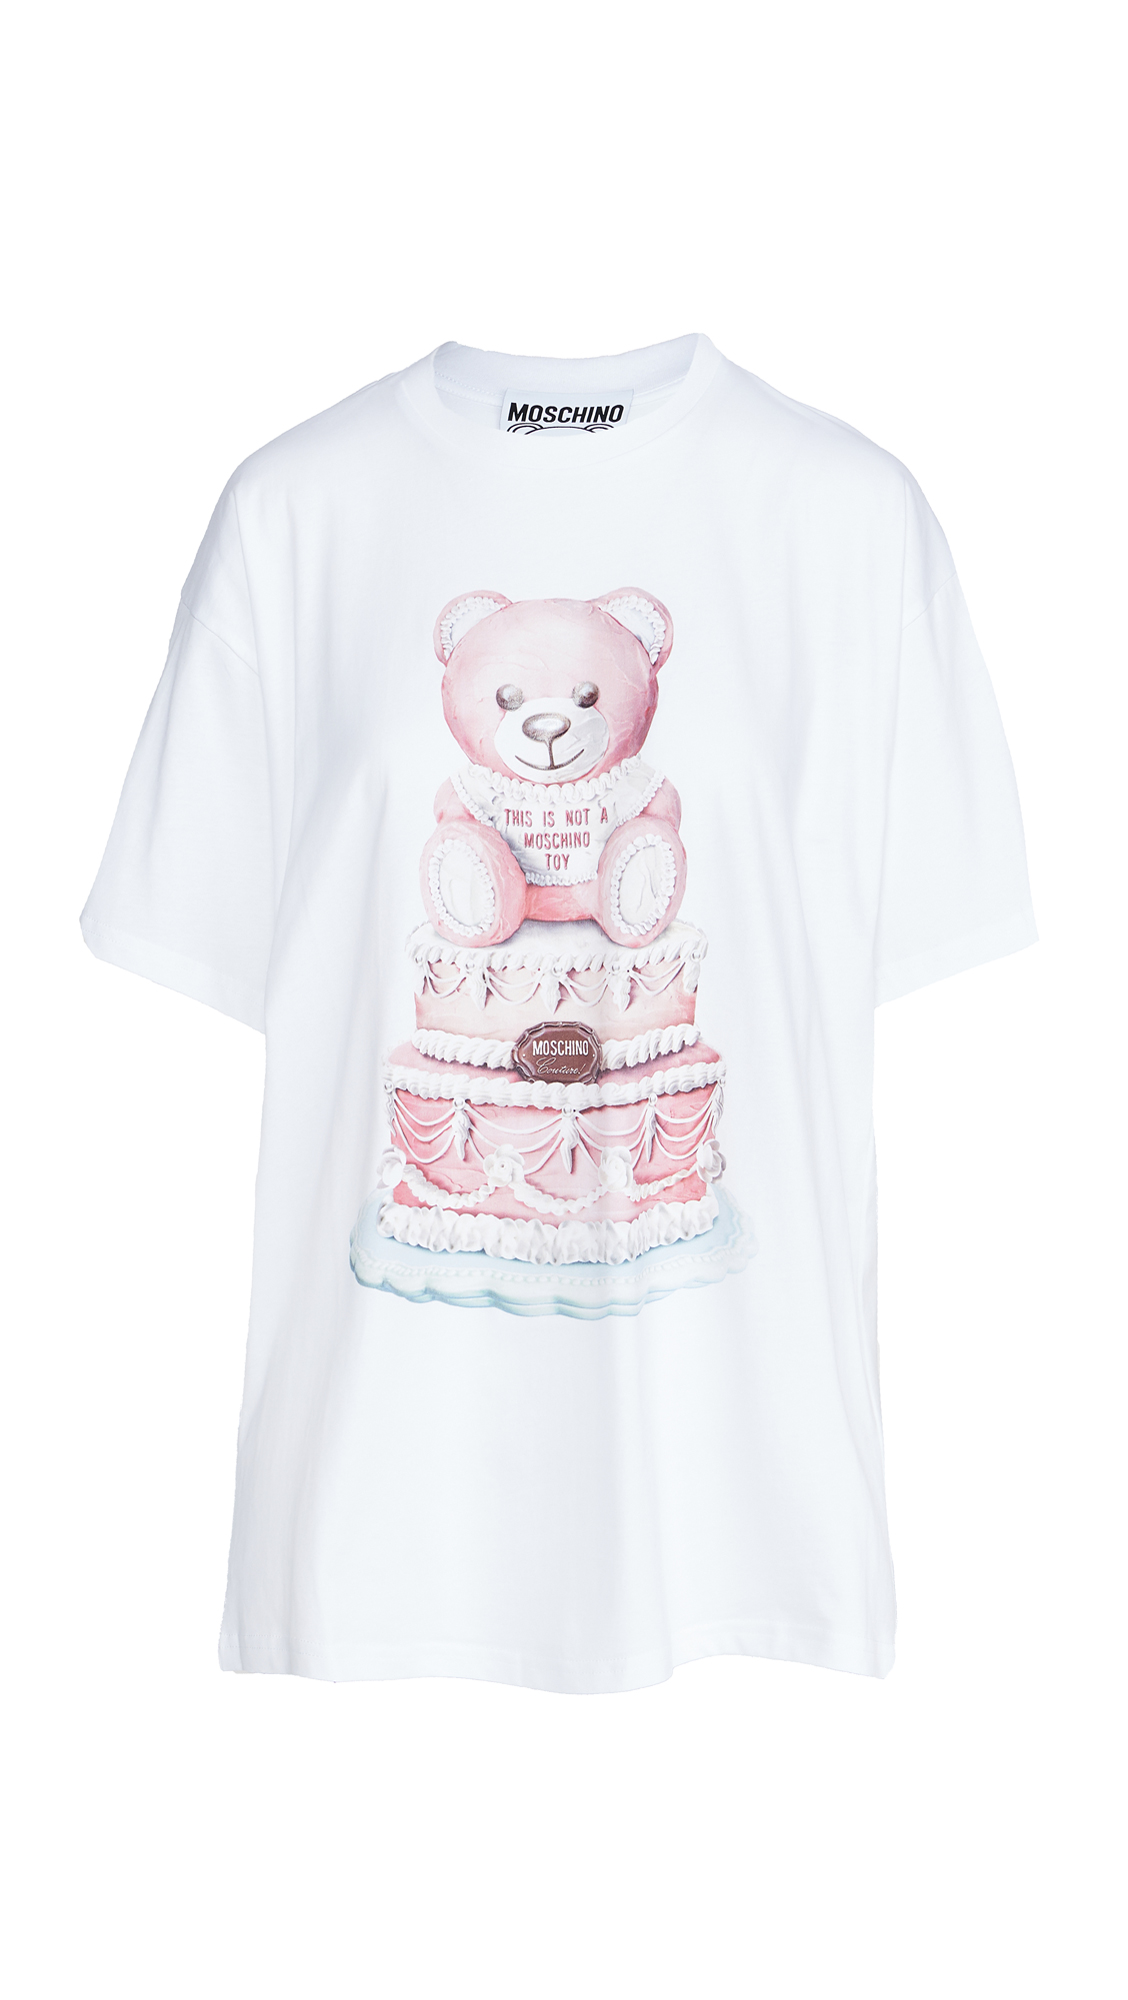 MOSCHINO BEAR CAKE TEE